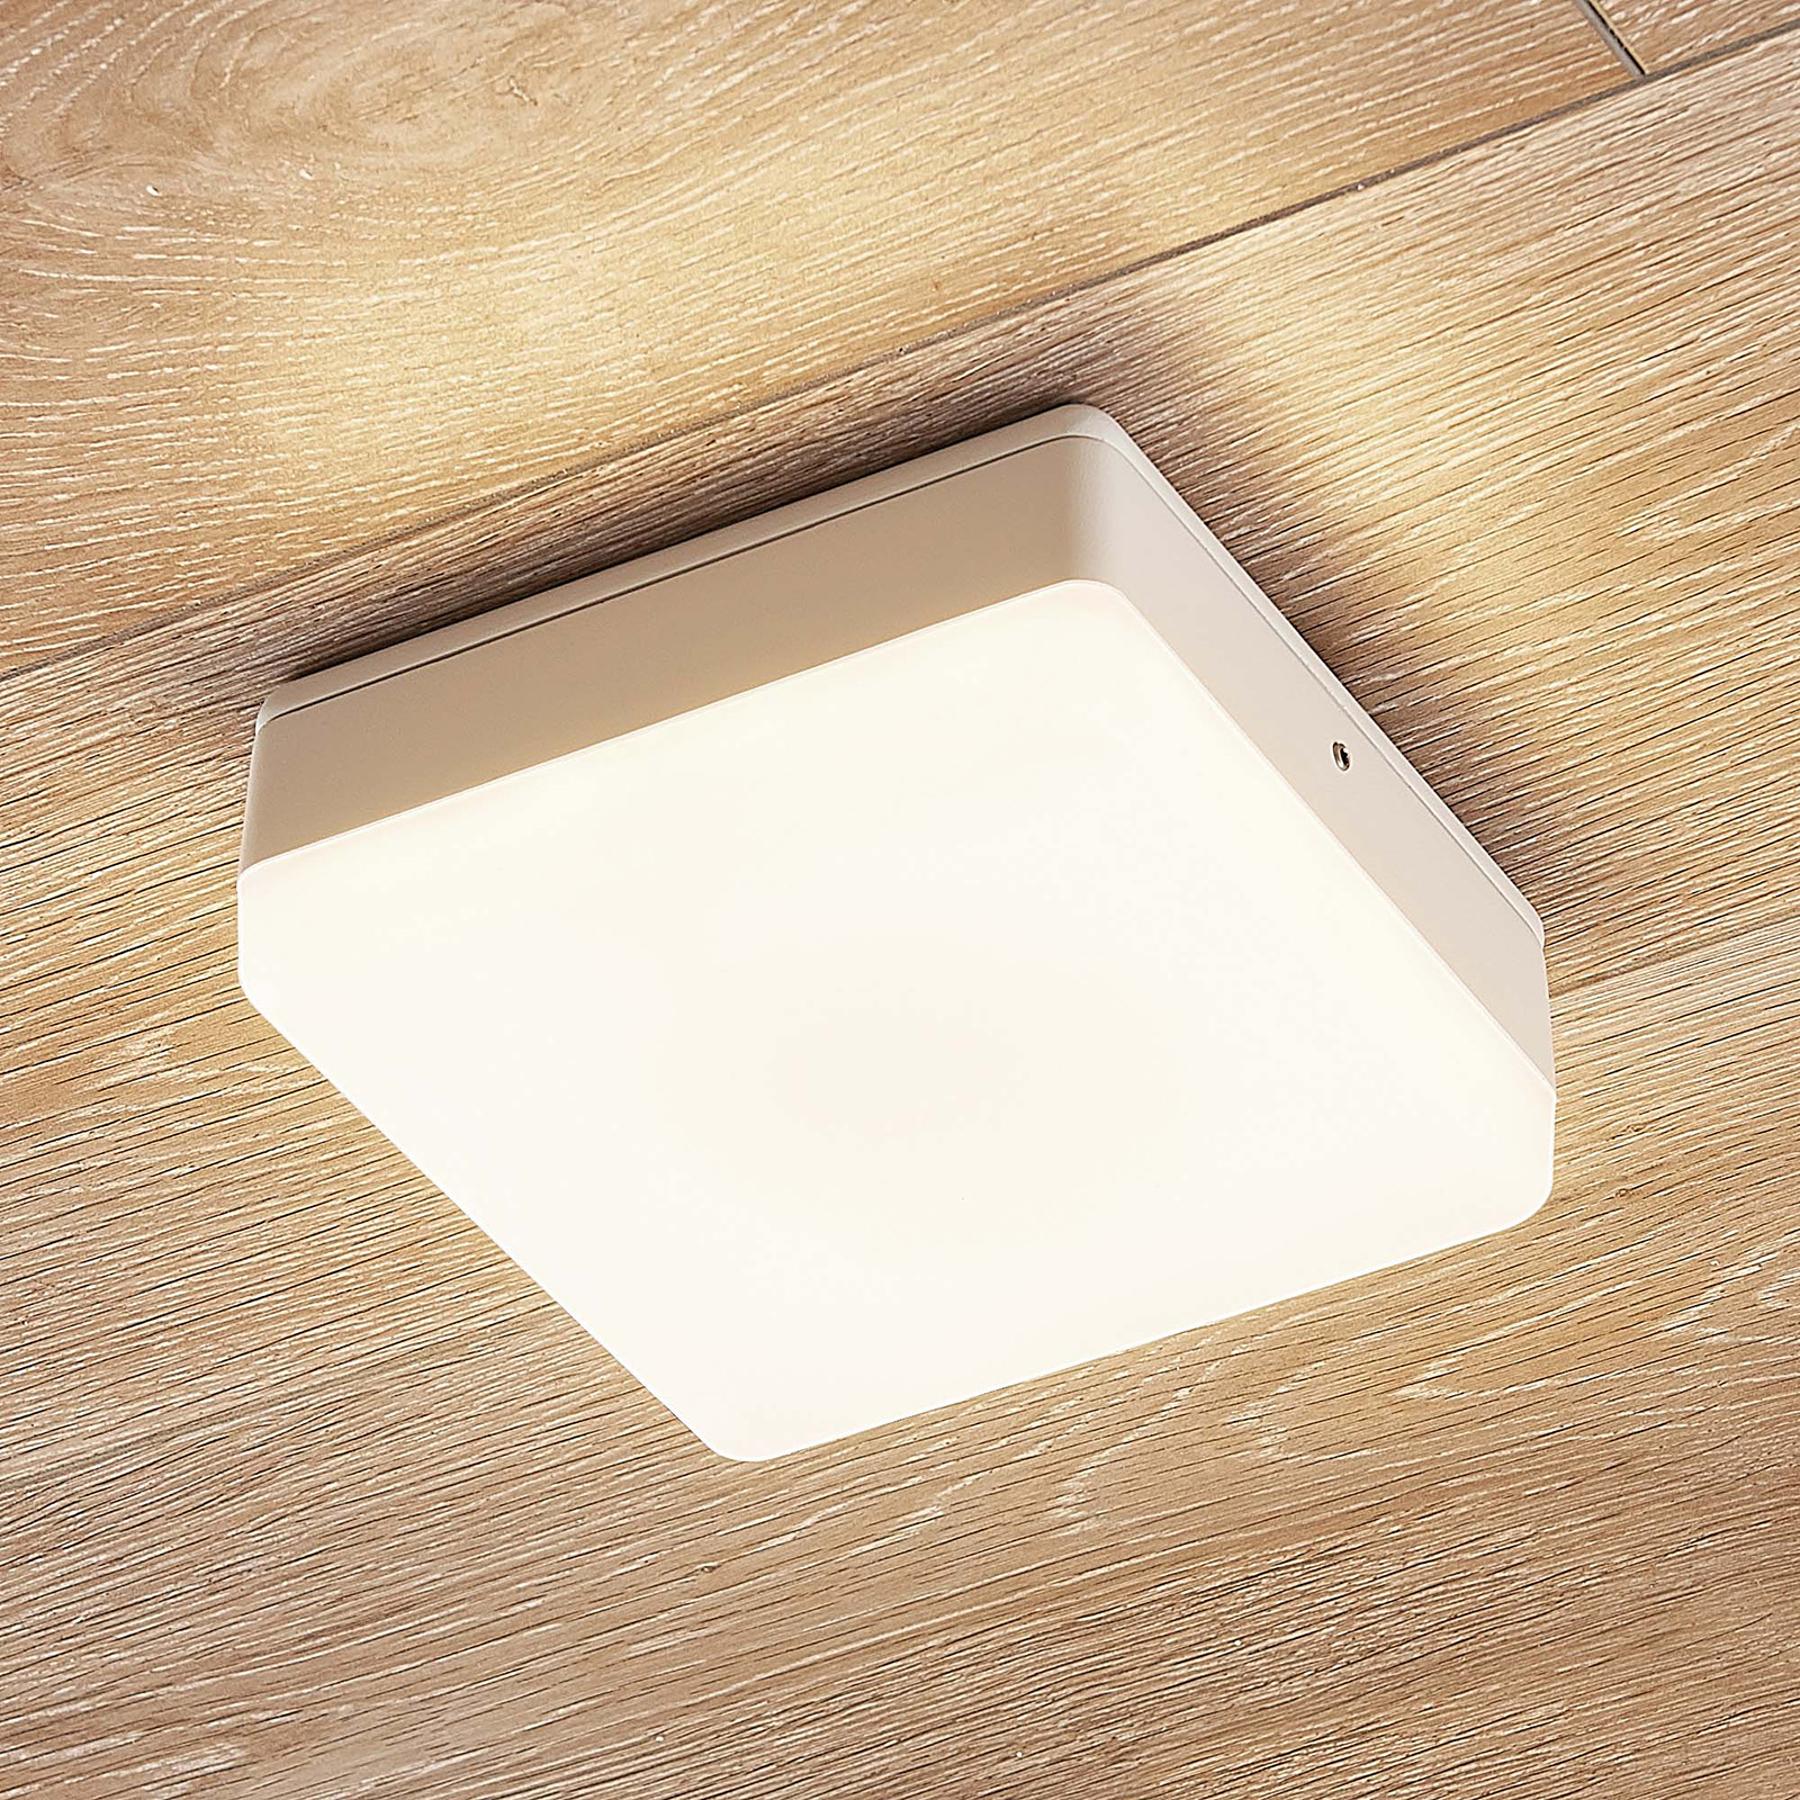 Lampa sufitowa LED Thilo, biała,16 cm, czujnik TL